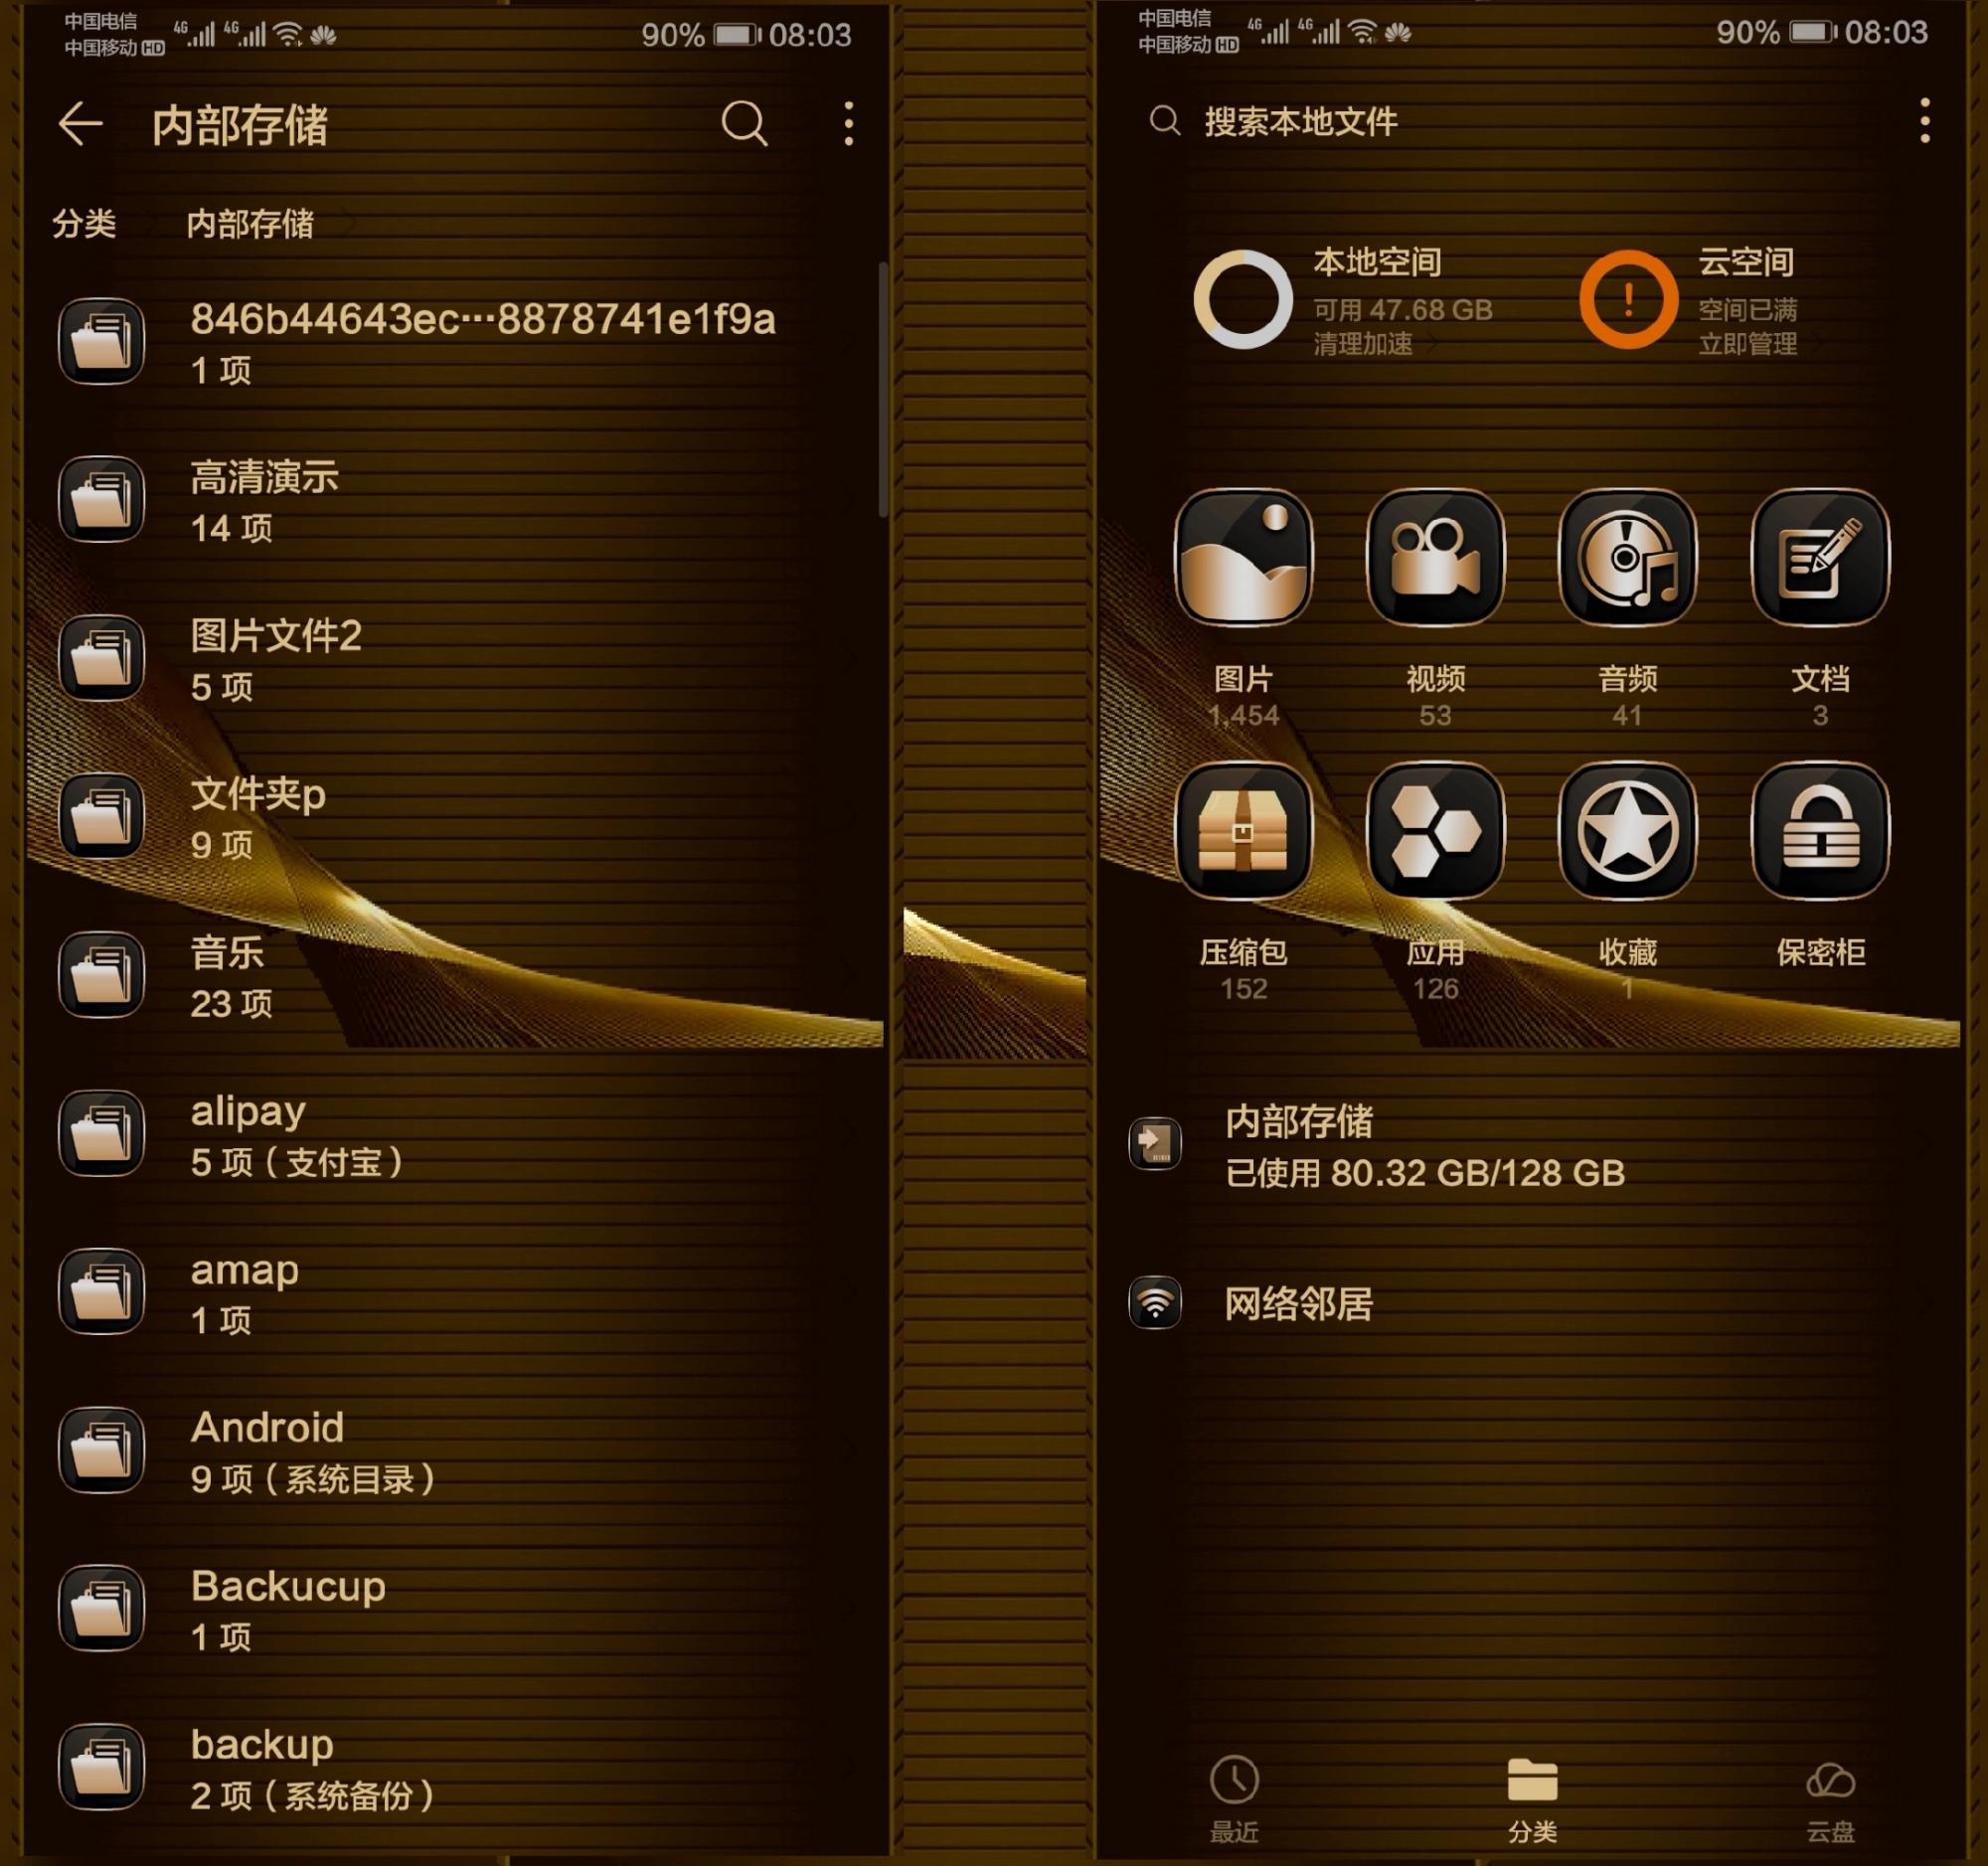 background_emui.9_1566364717566_1566377788746_1566432282109.jpg